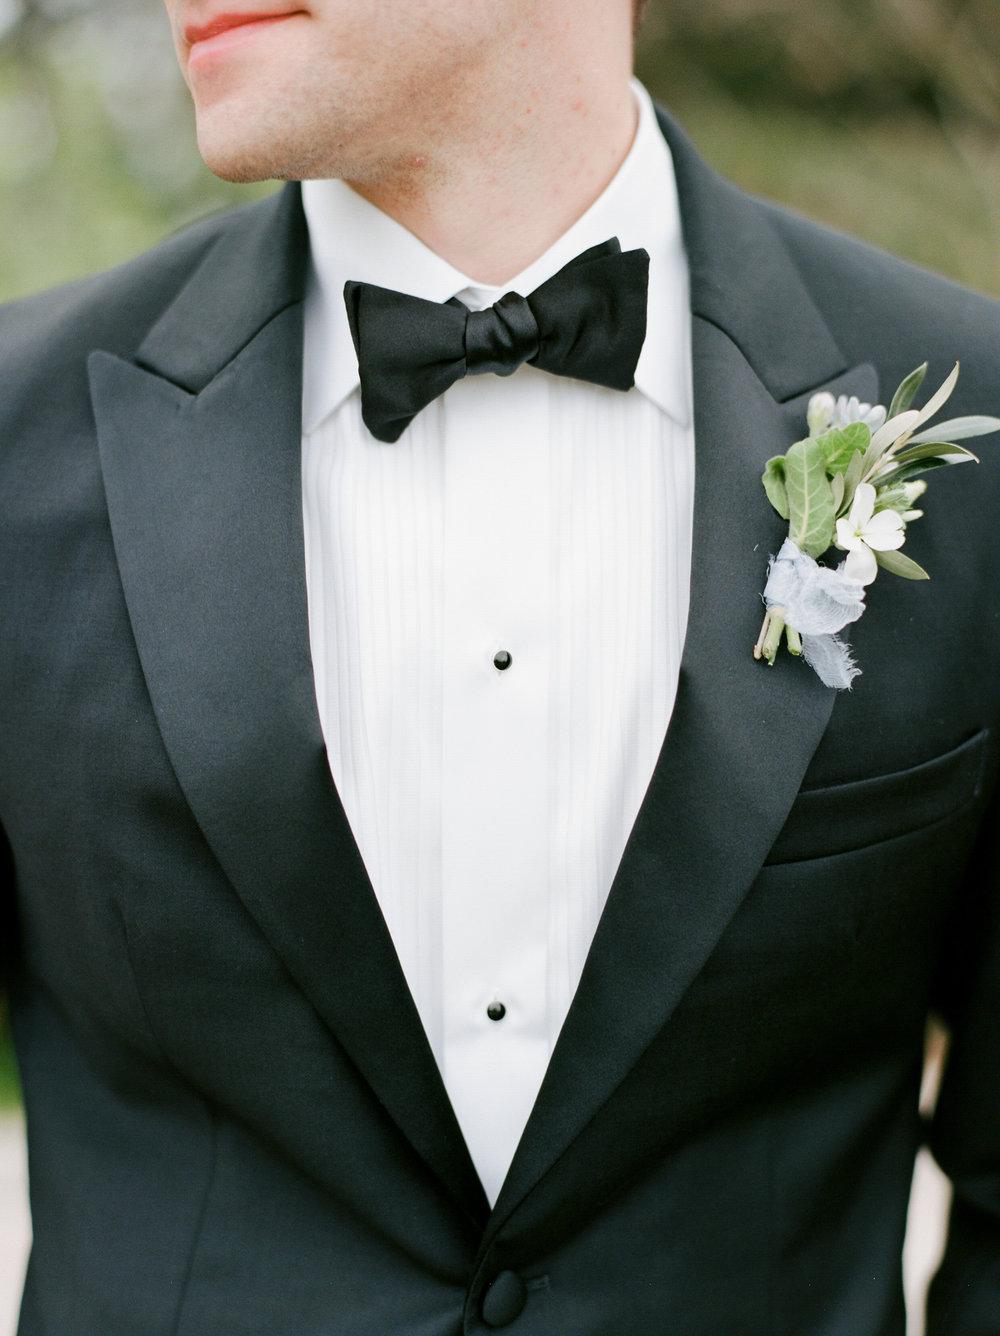 McGovern-Centennial-Gardens-Houston-Texas-Wedding-Venue-Josh-Dana-Fernandez-Photography-Film-Destination-Fine-Art-Luxury-Top-Best-Austin-Dallas-Magnolia-Rouge-Jennifer-Laura-Design-5.jpg